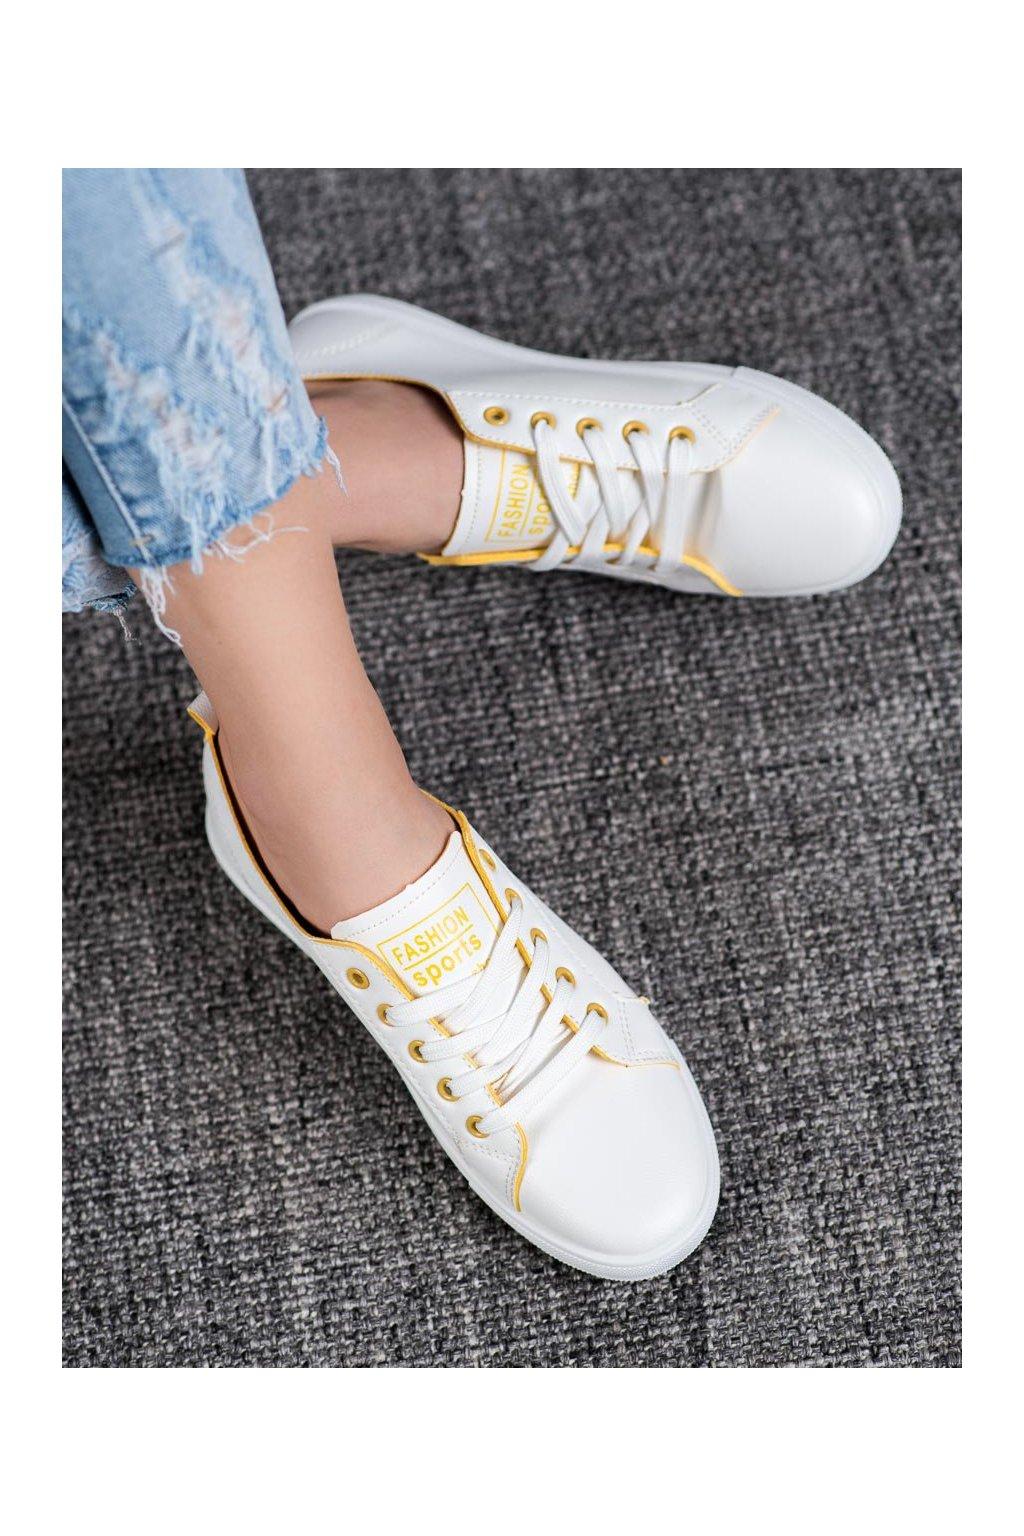 Biele tenisky Ideal shoes kod LX-9859W/Y